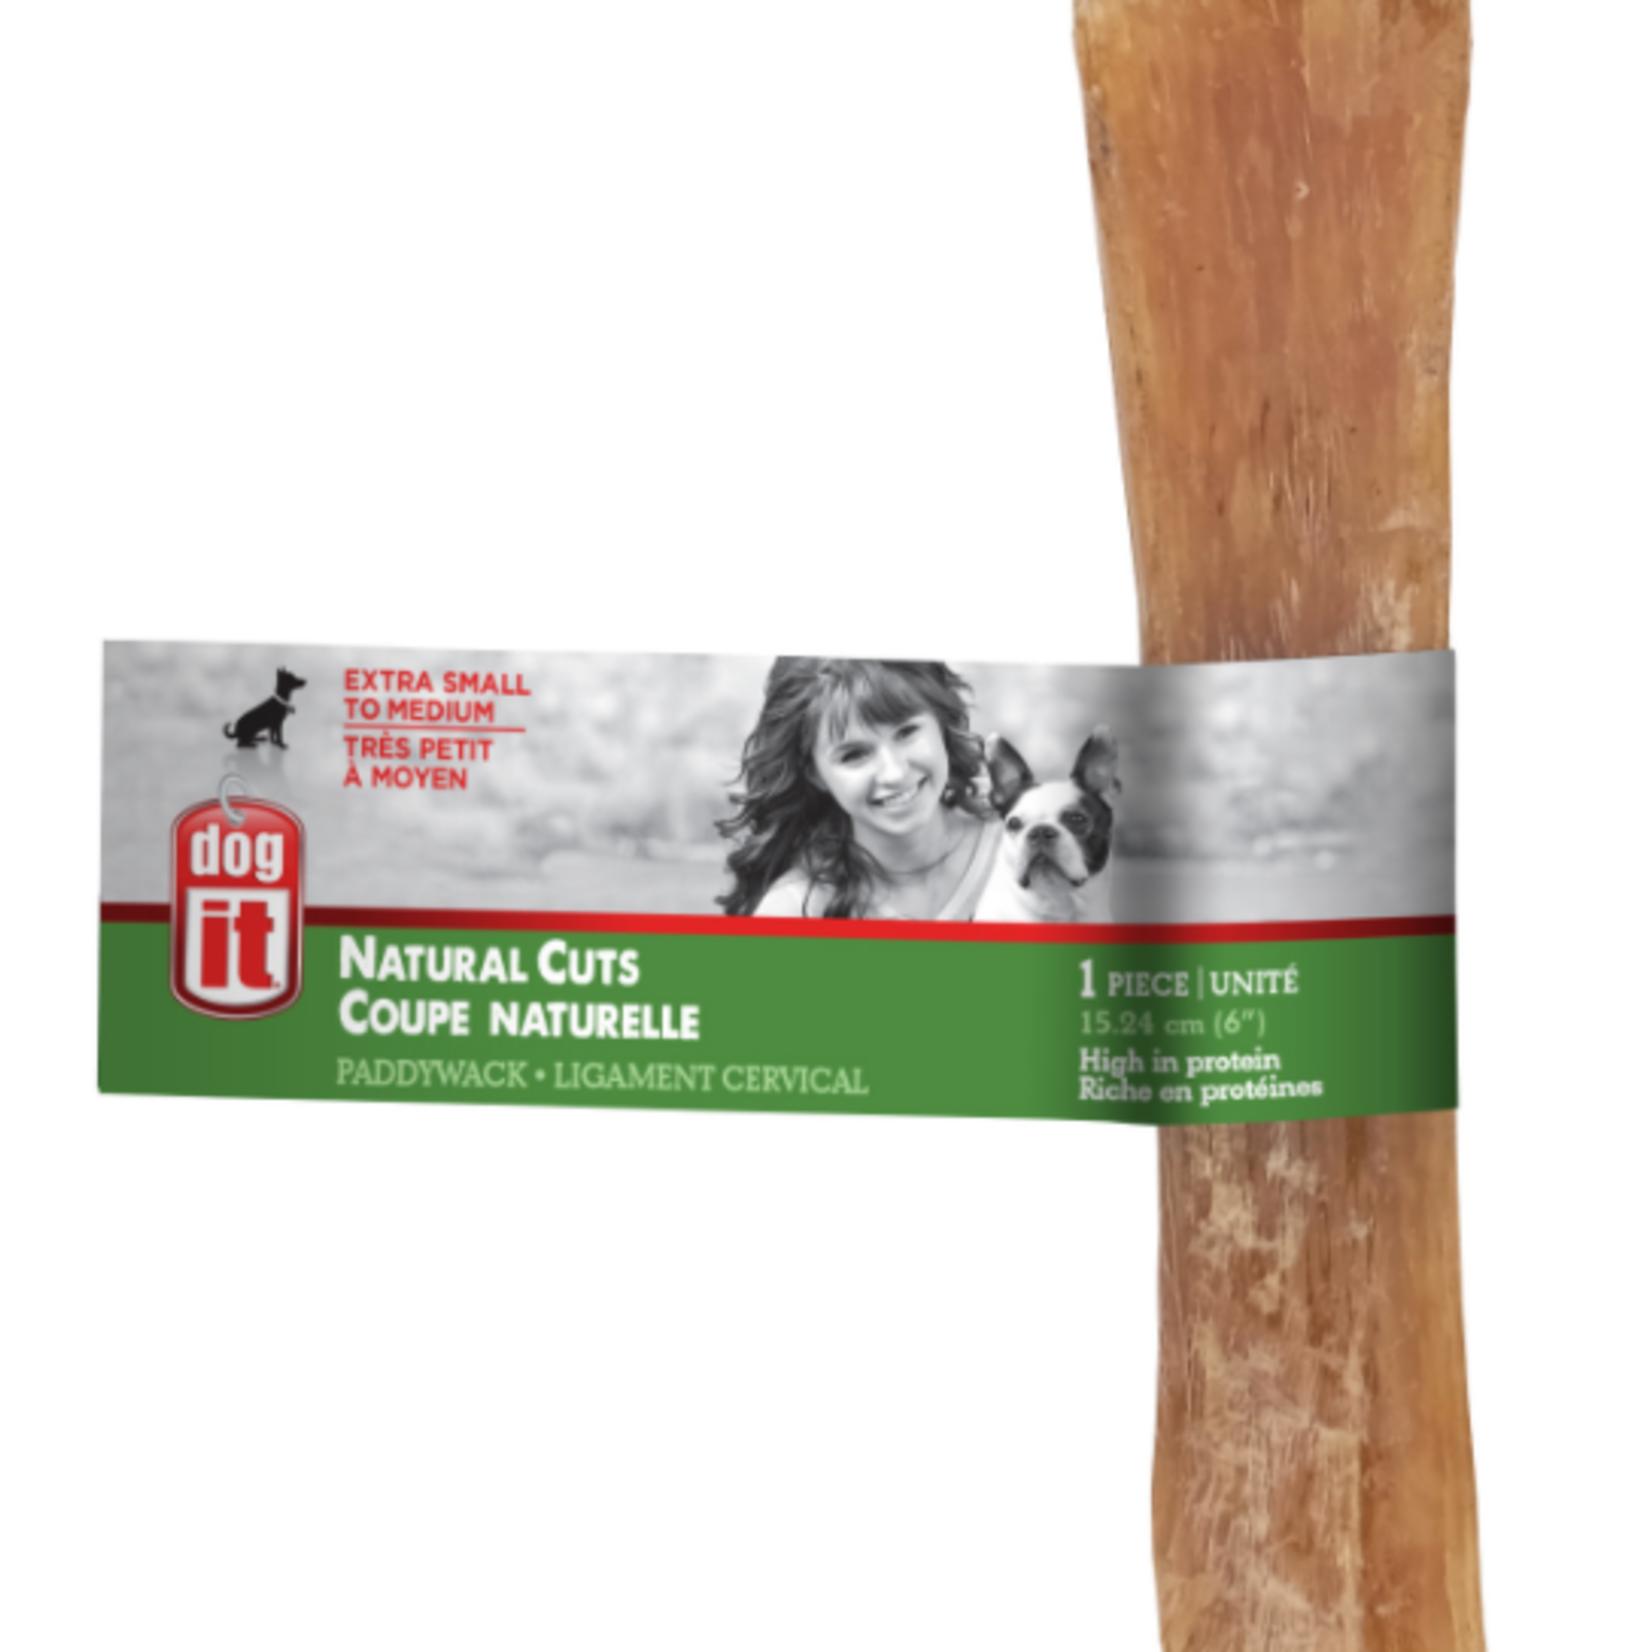 Dogit Paddywack Natural Cuts - 6 po - Paquet de 1